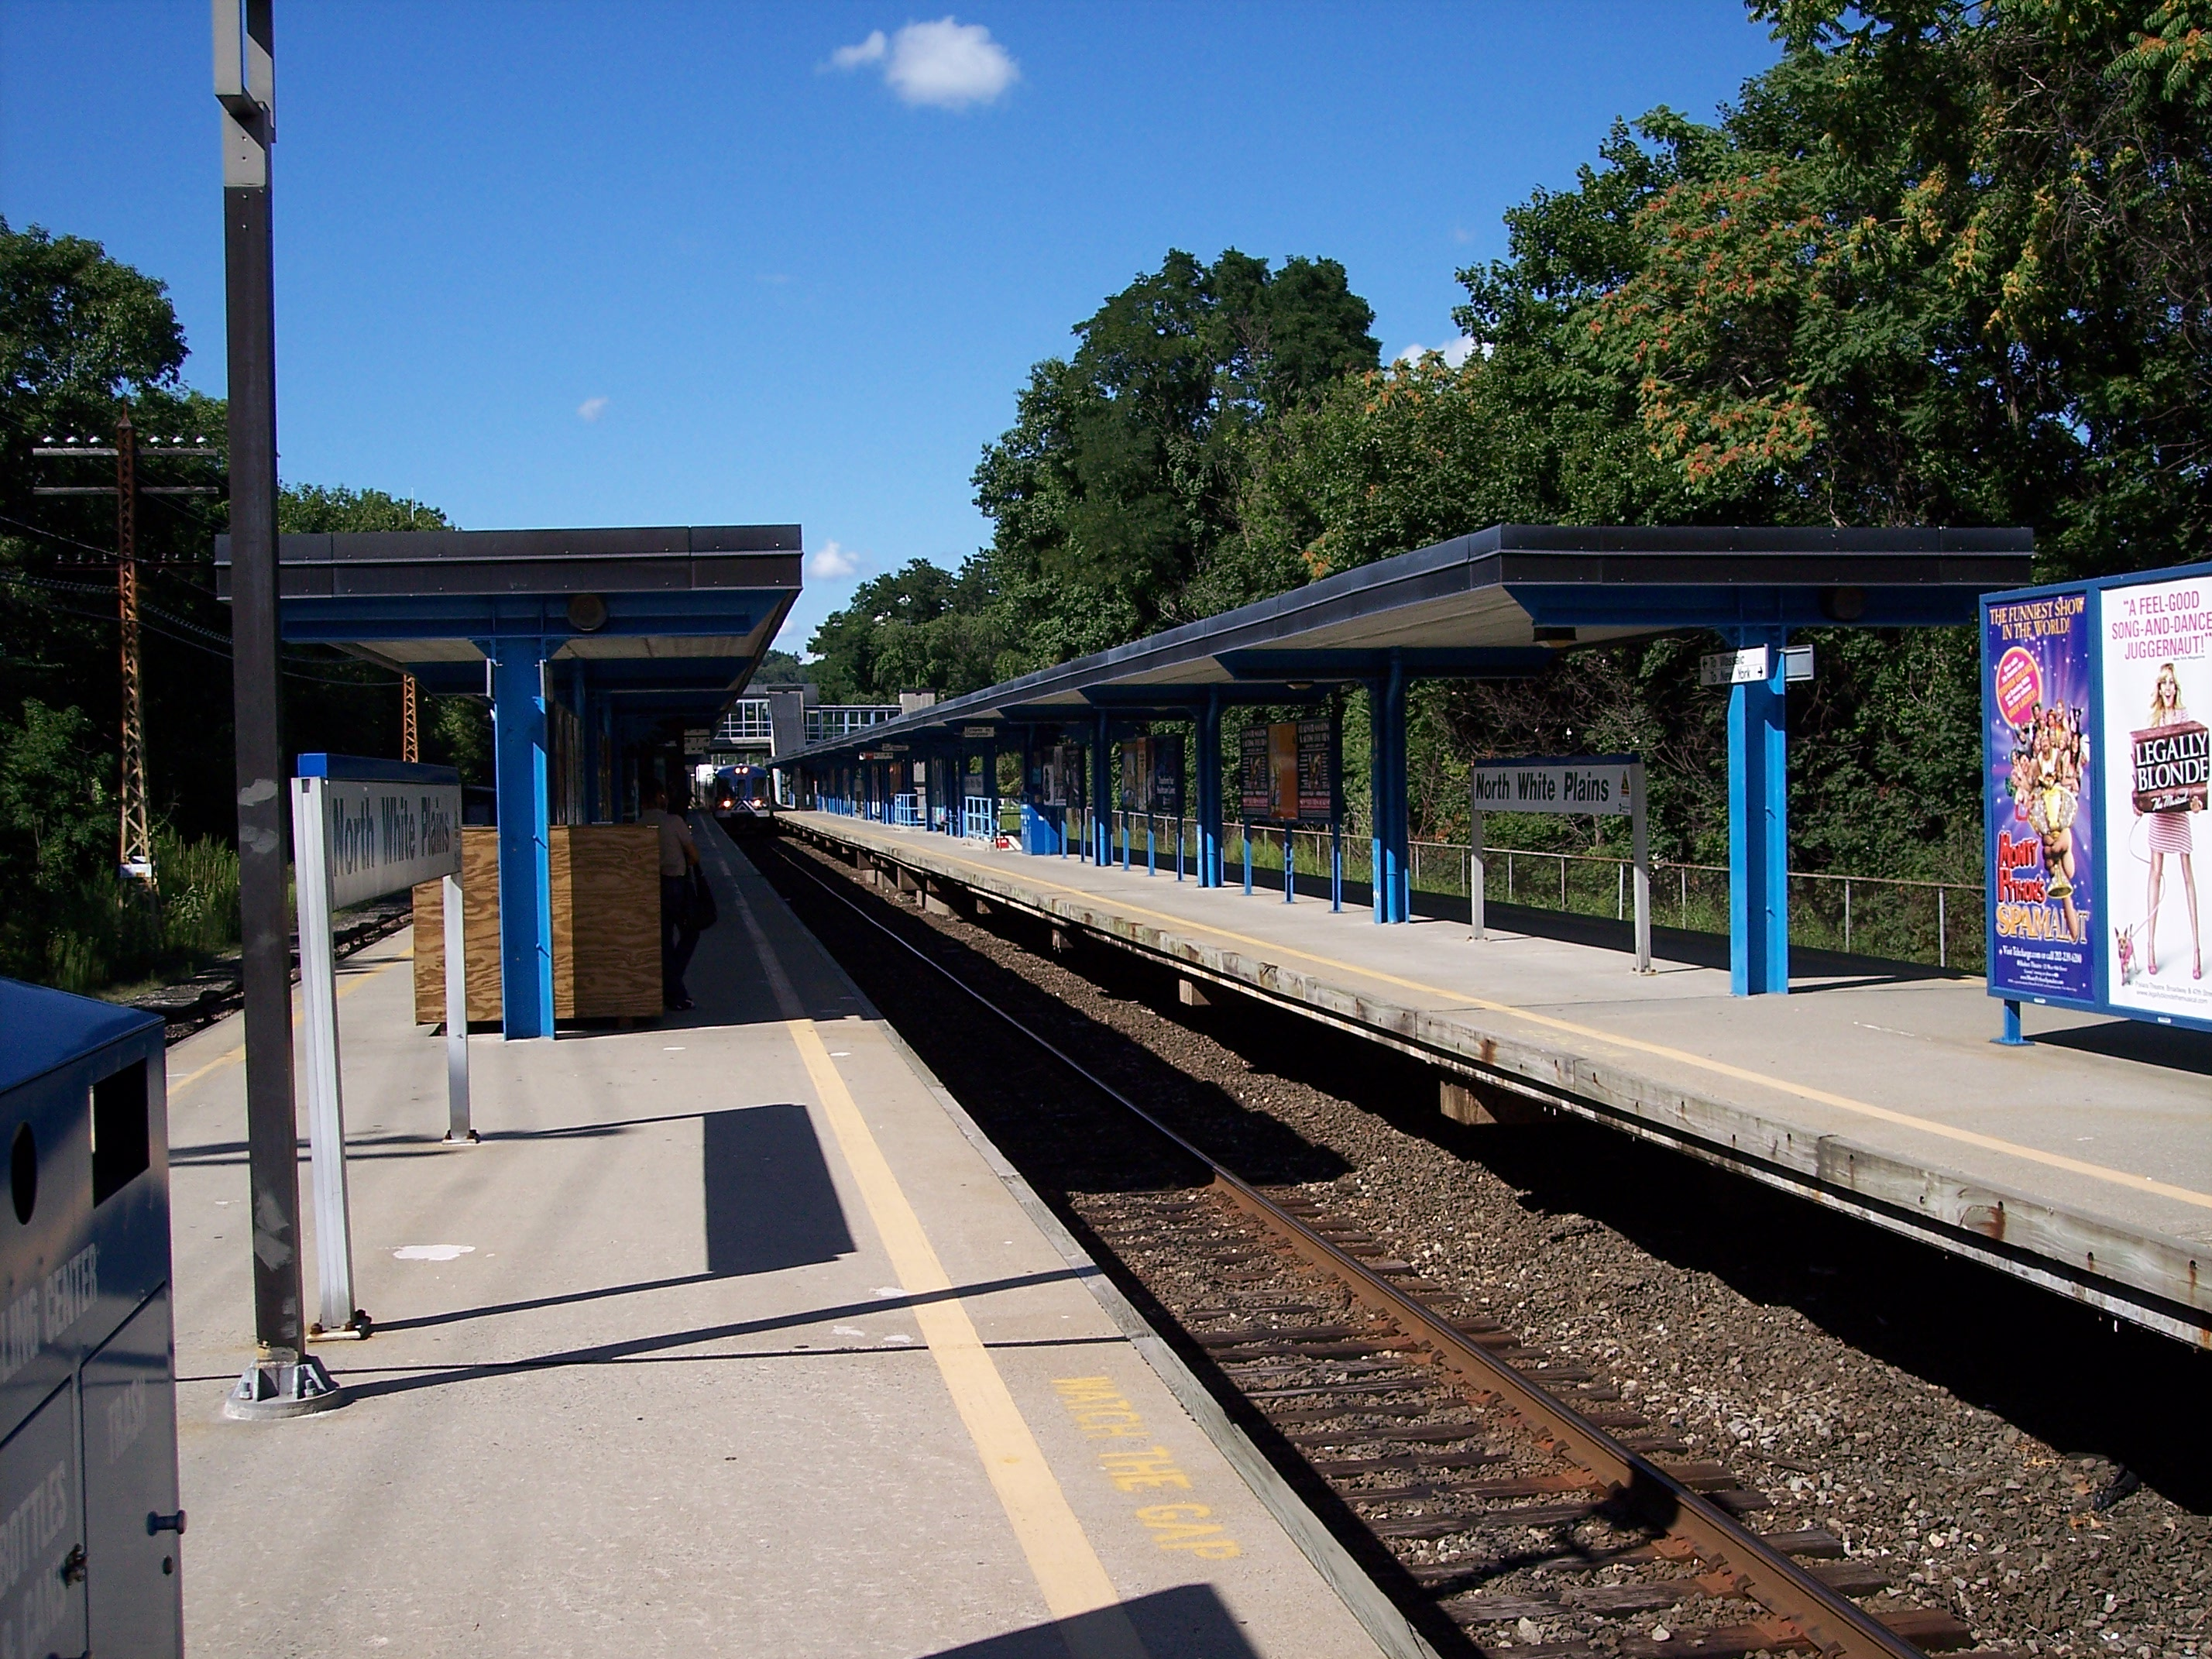 White plains new york train station schedule union